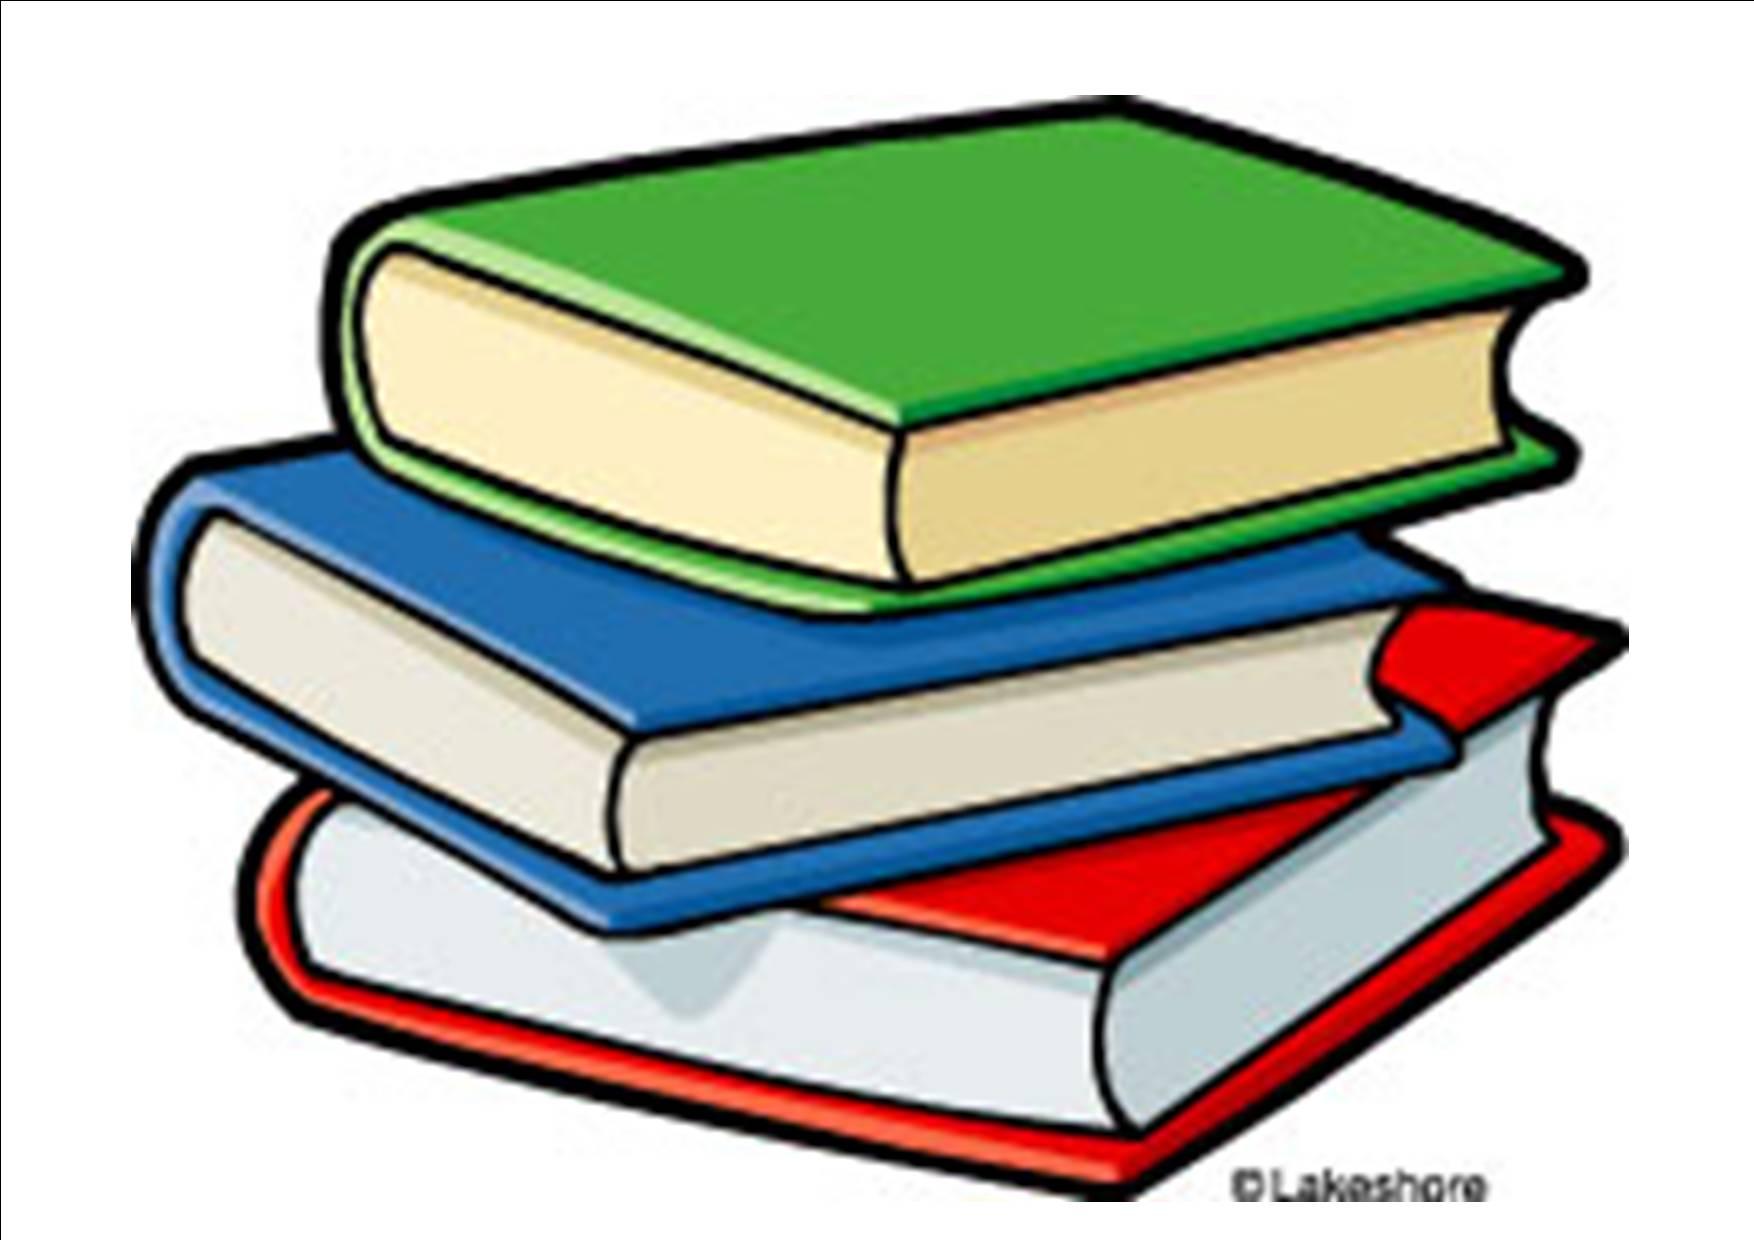 book-20clipart-books-for-clip-art-9